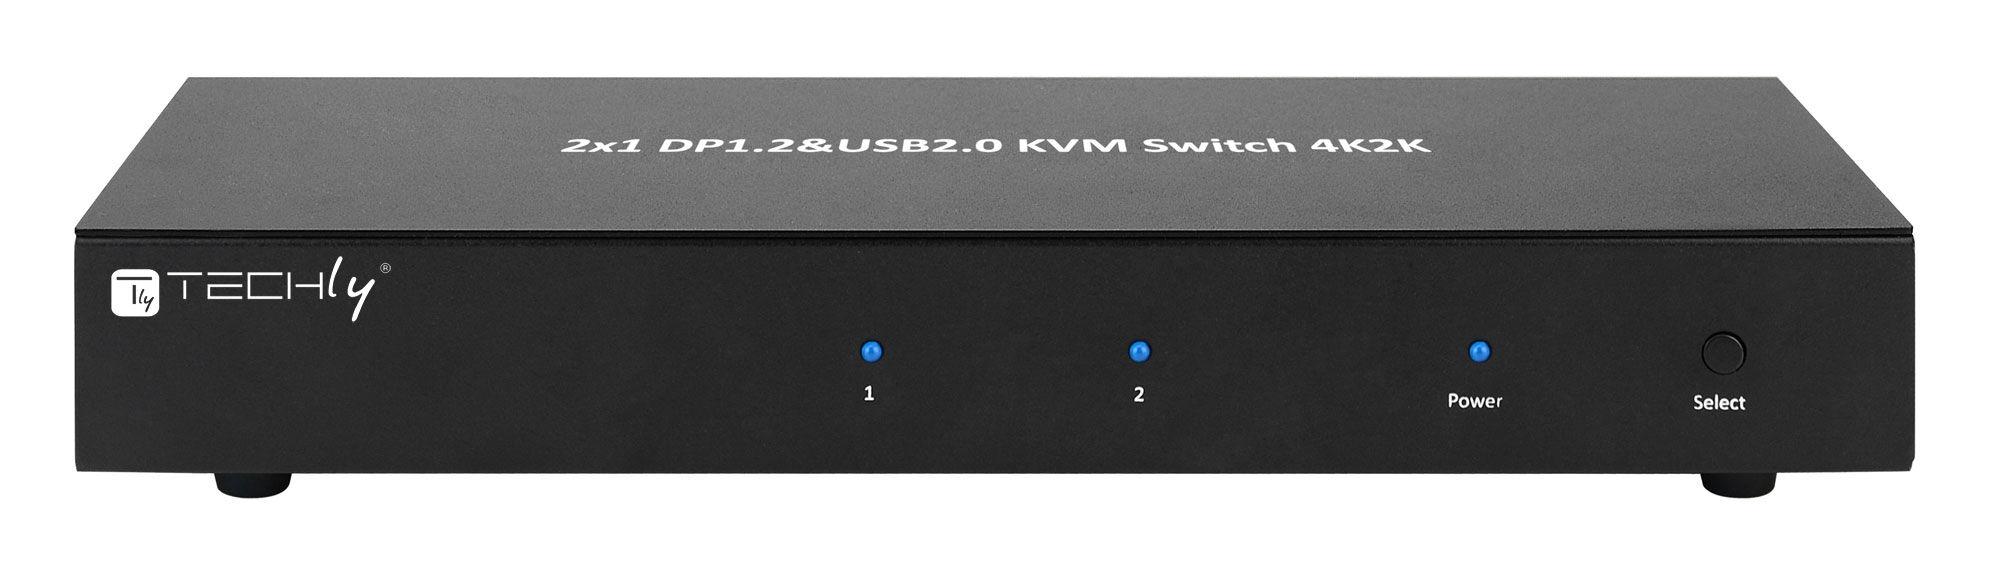 techly switch kvm 2 porte displayport1.2 per doppio monitor